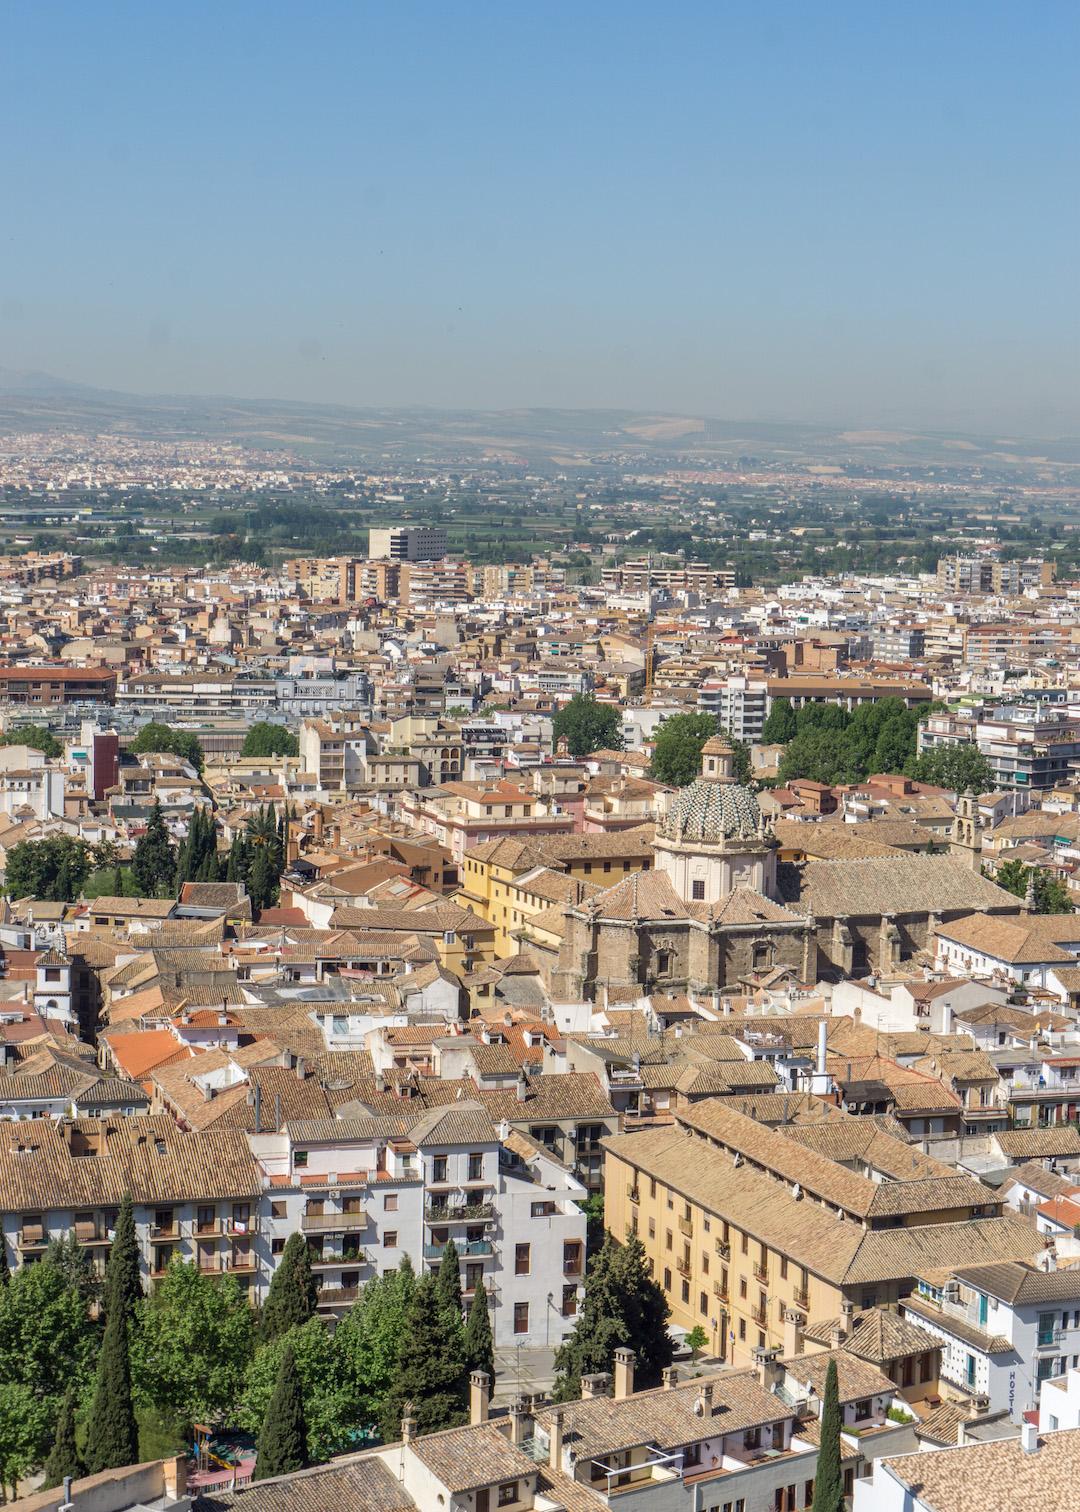 Her_Travel_Edit_Granada_City_View